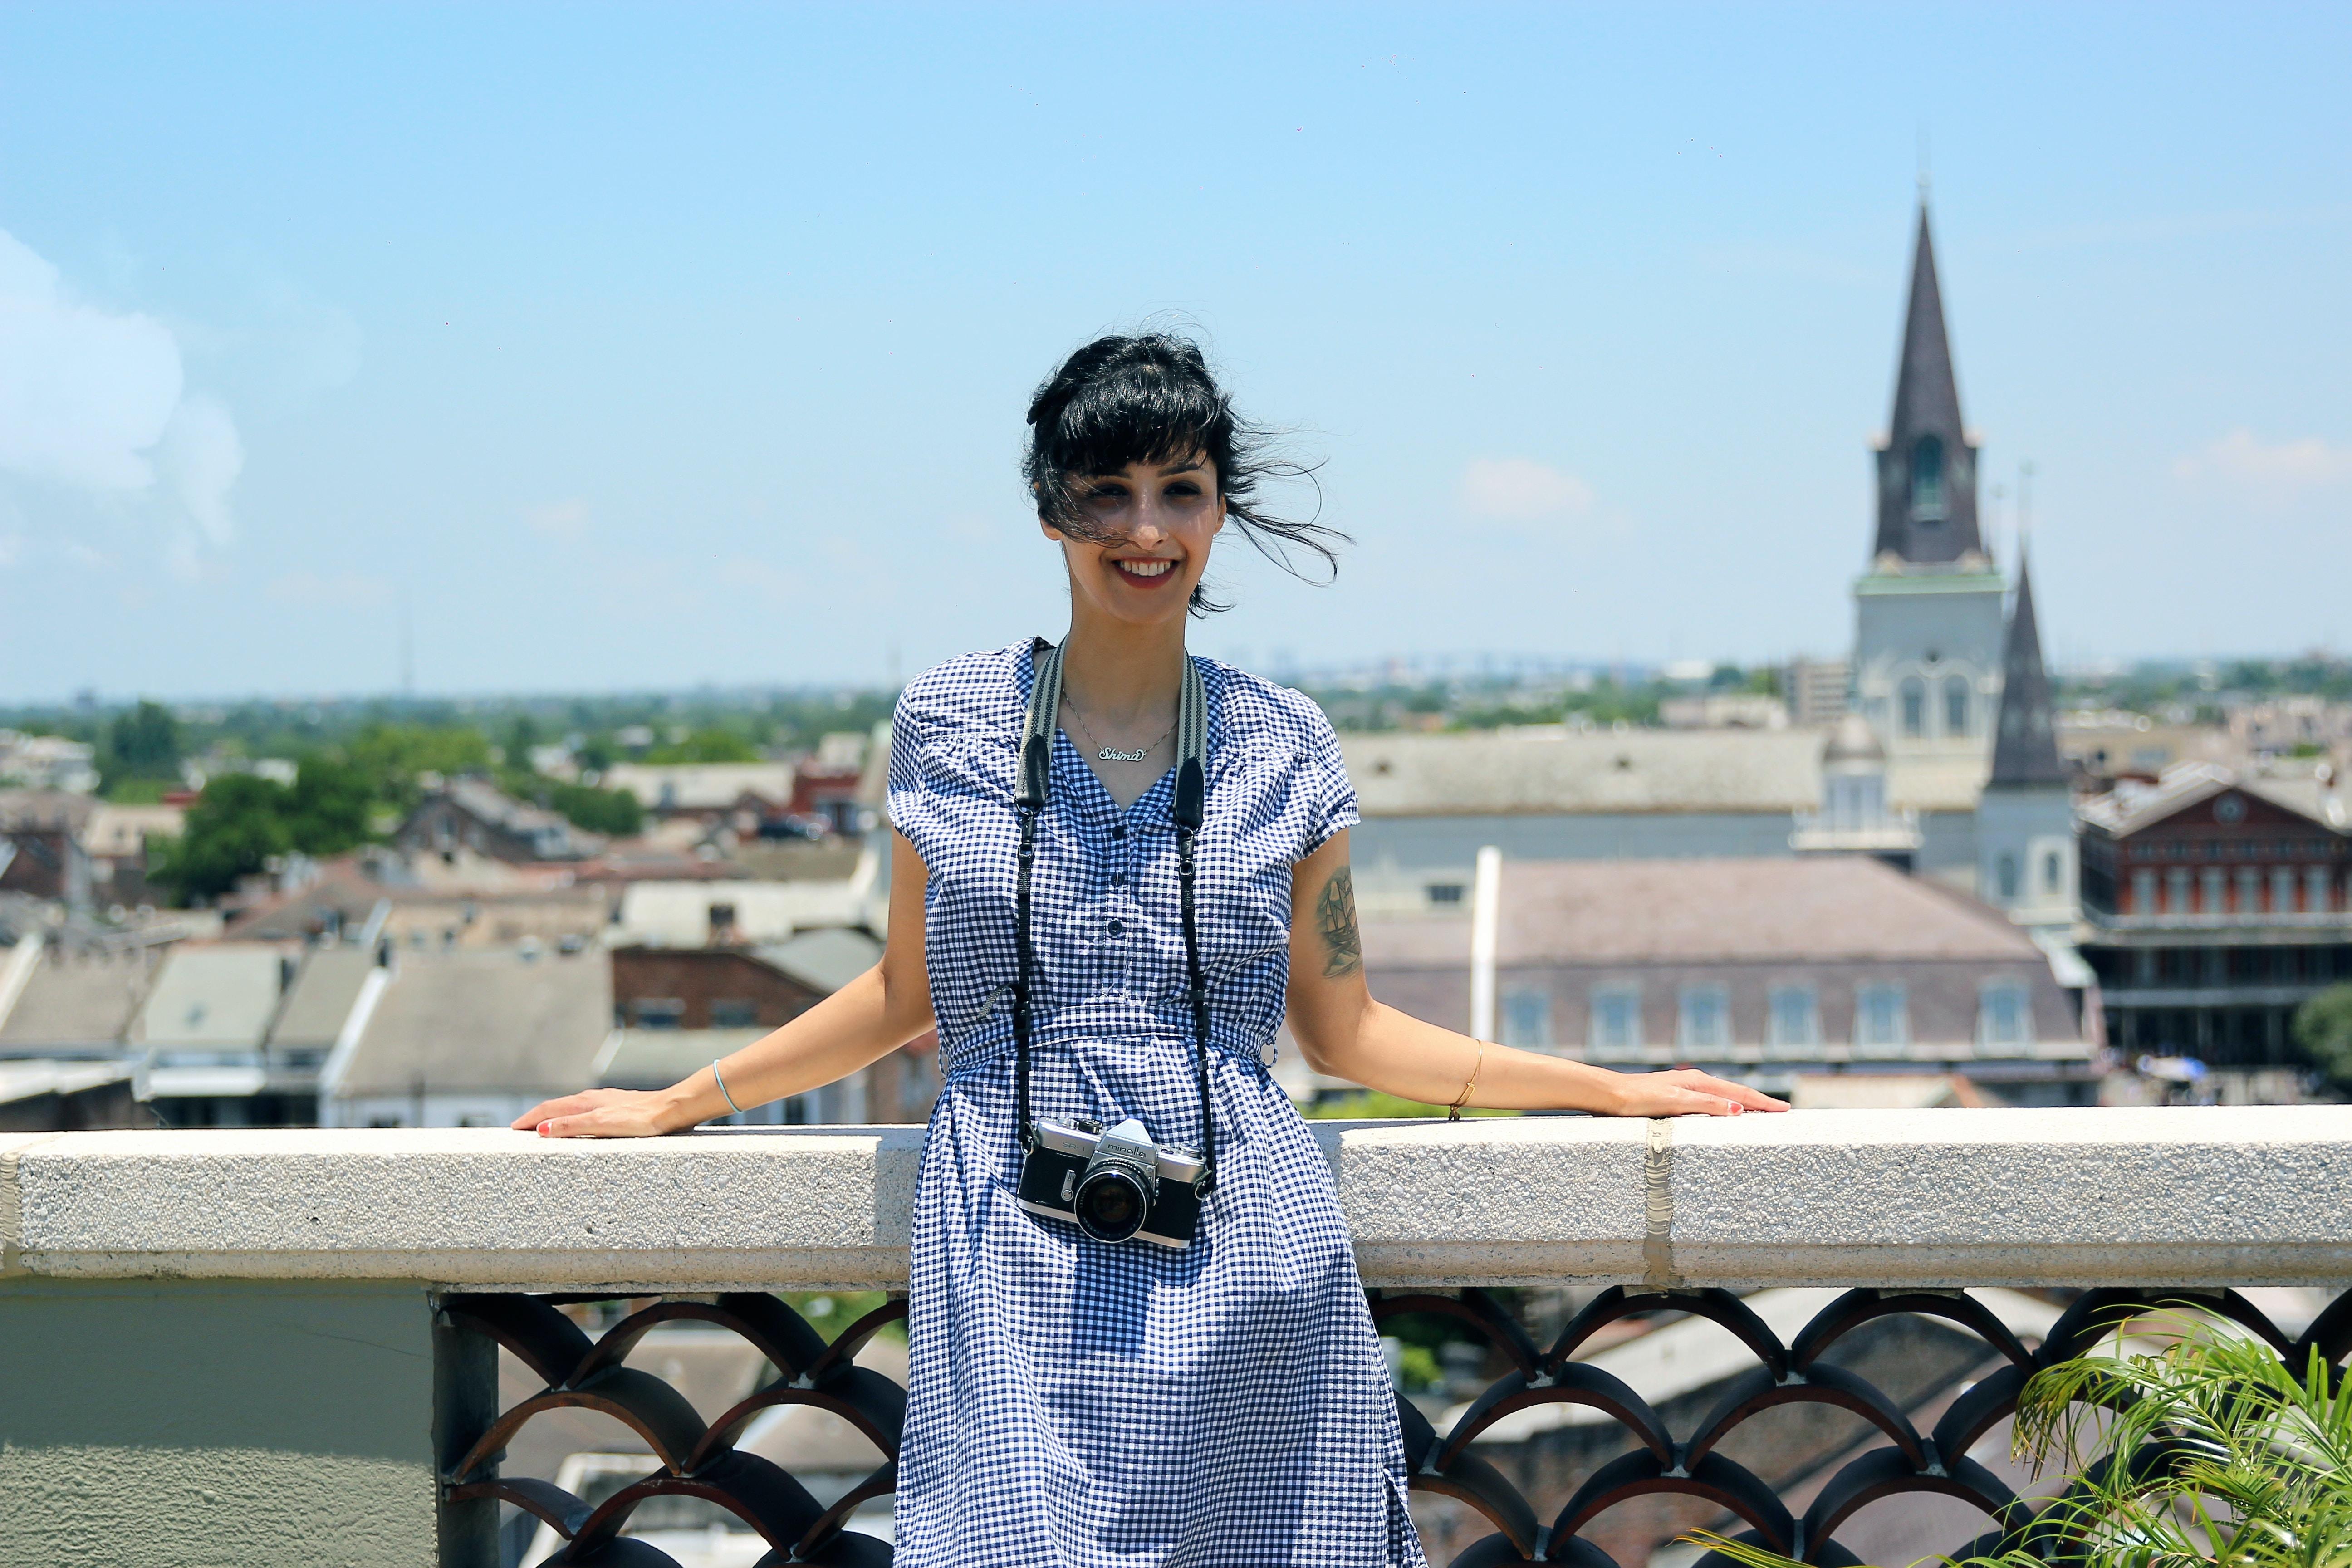 woman wearing blue dress standing beside stand